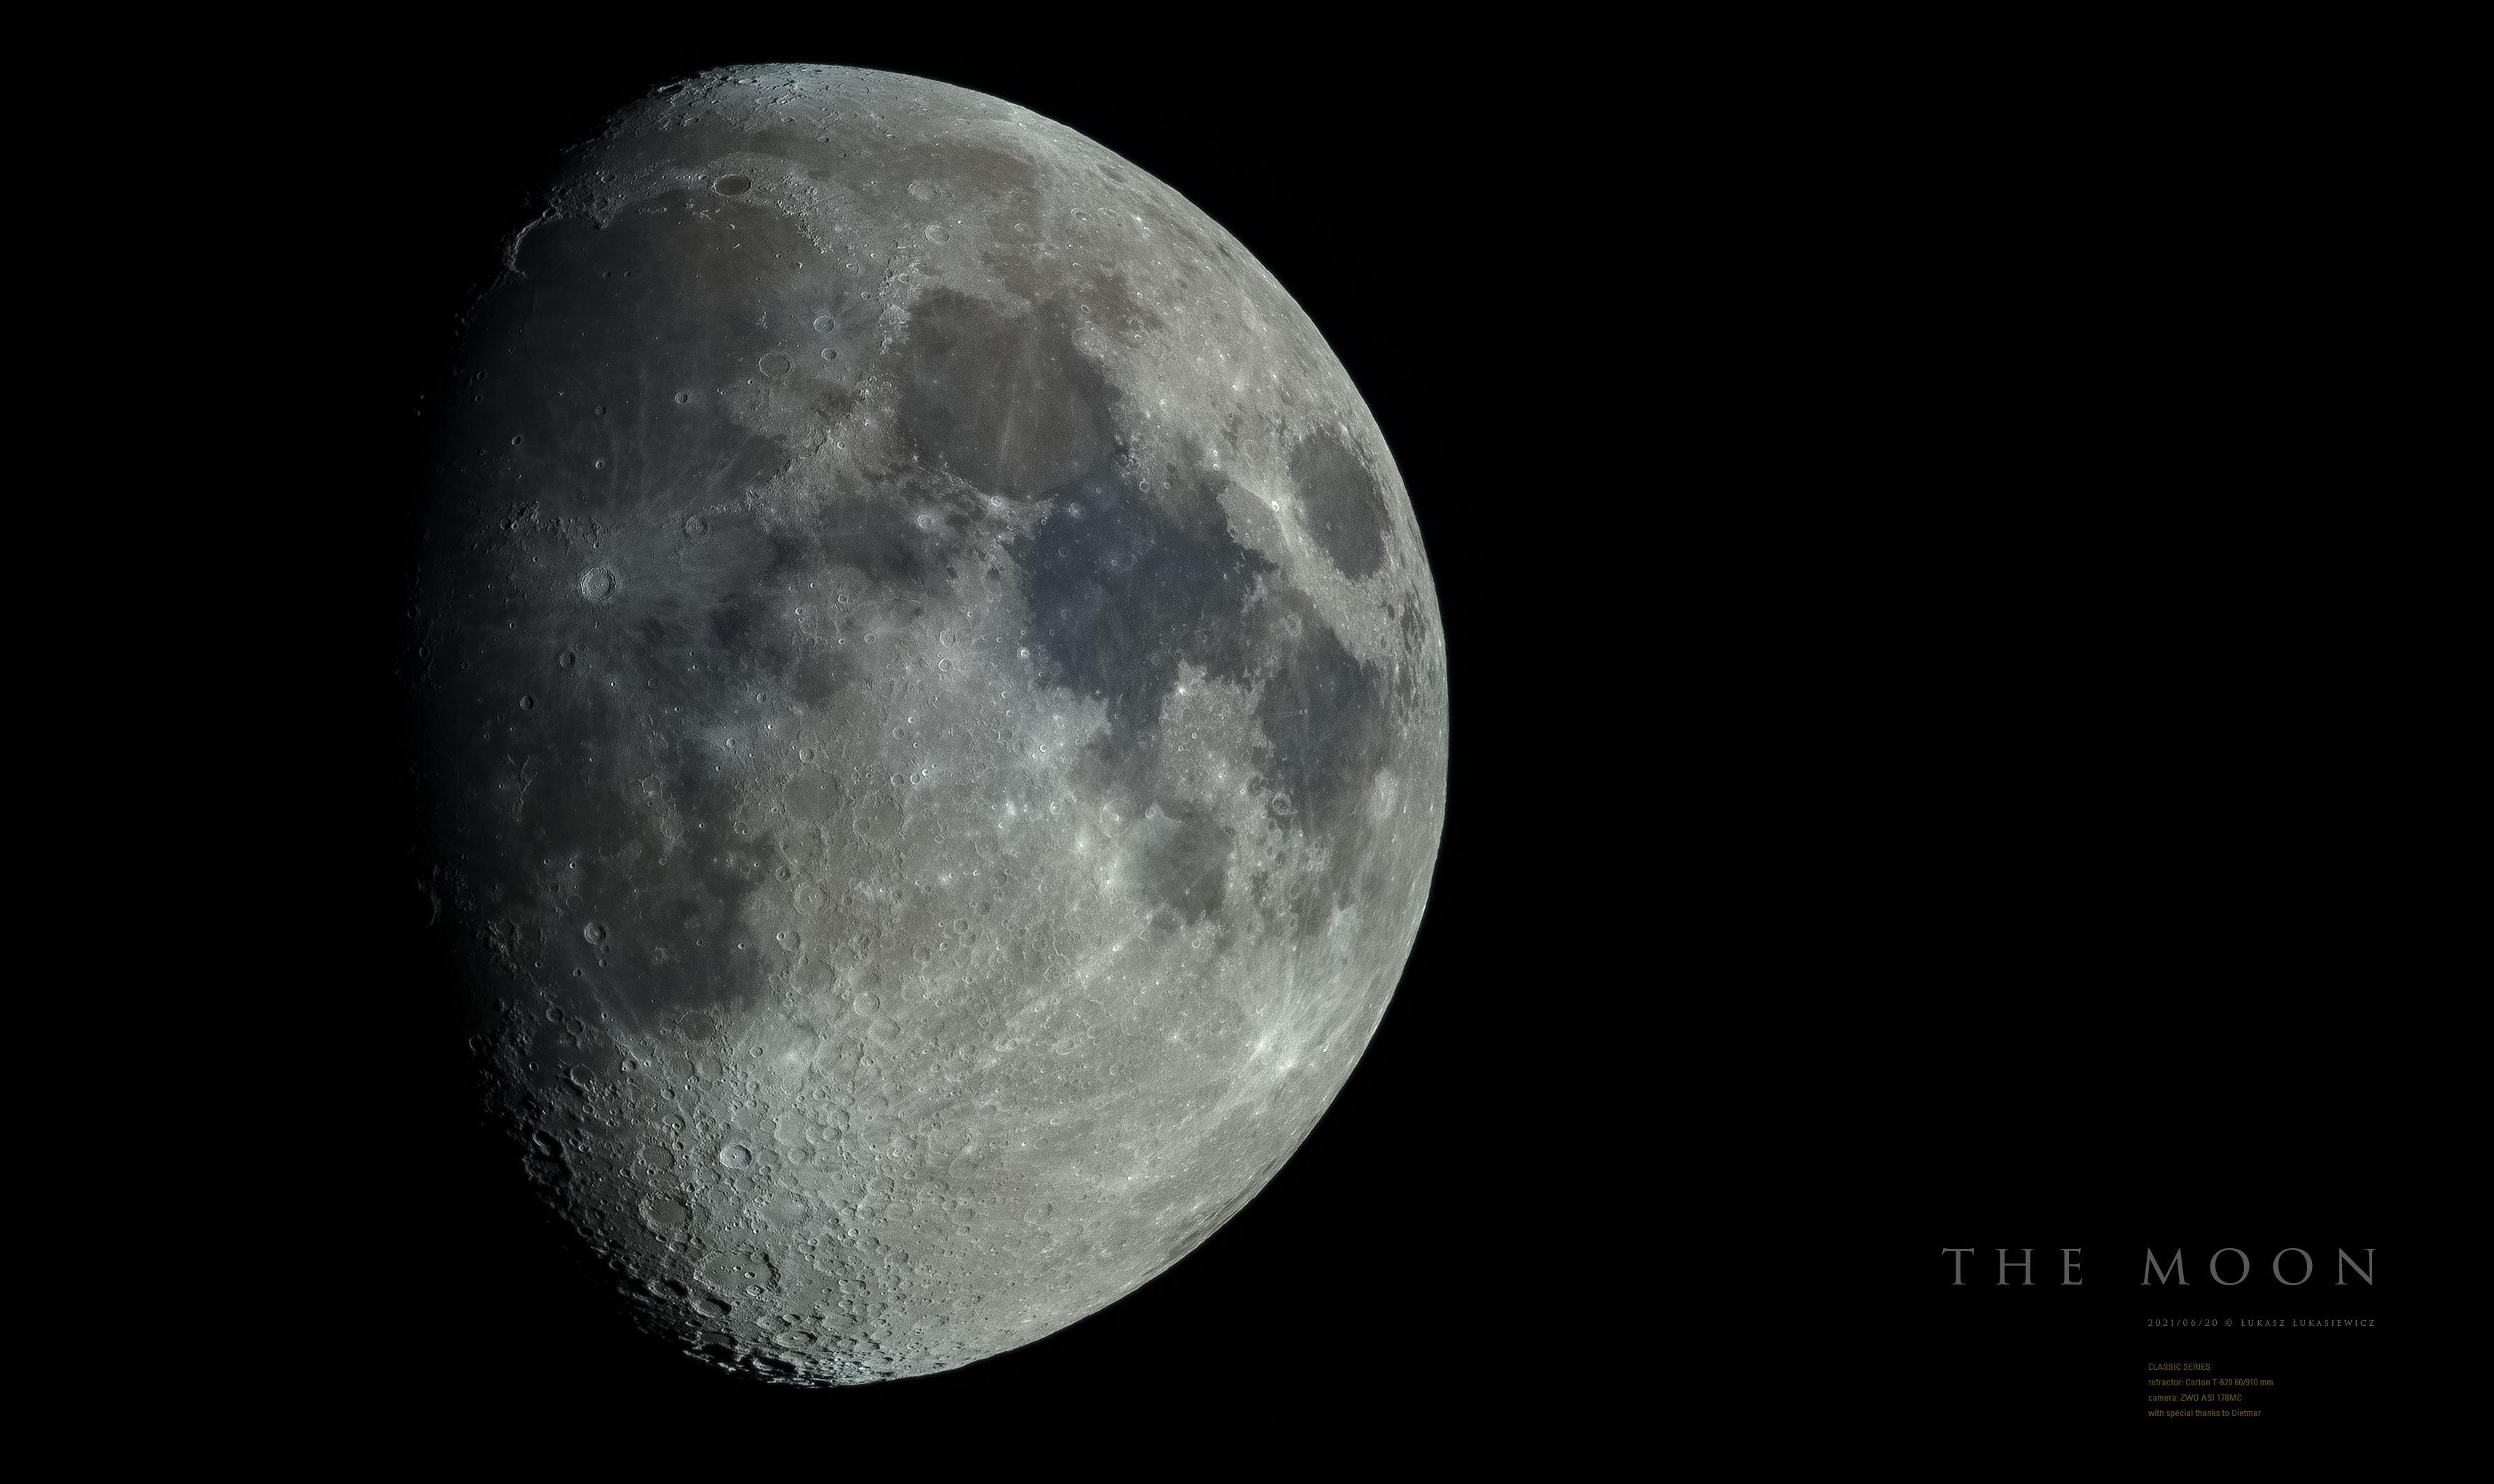 THE-MOON-2021-06-20-C.jpg